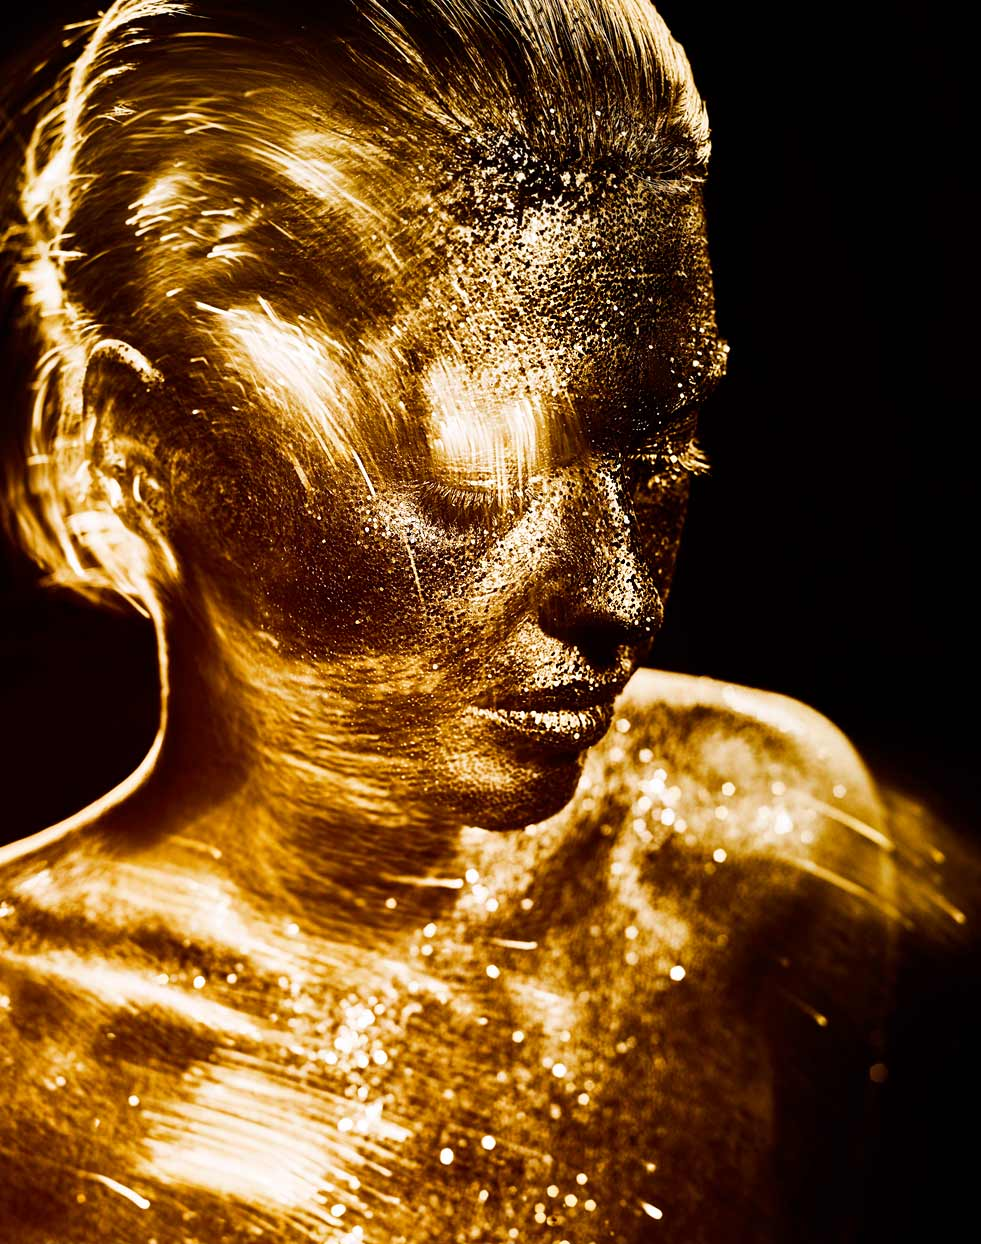 Mark DeLong - Beauty Photographer - Motion streaks of woman covered in gold glitter skin